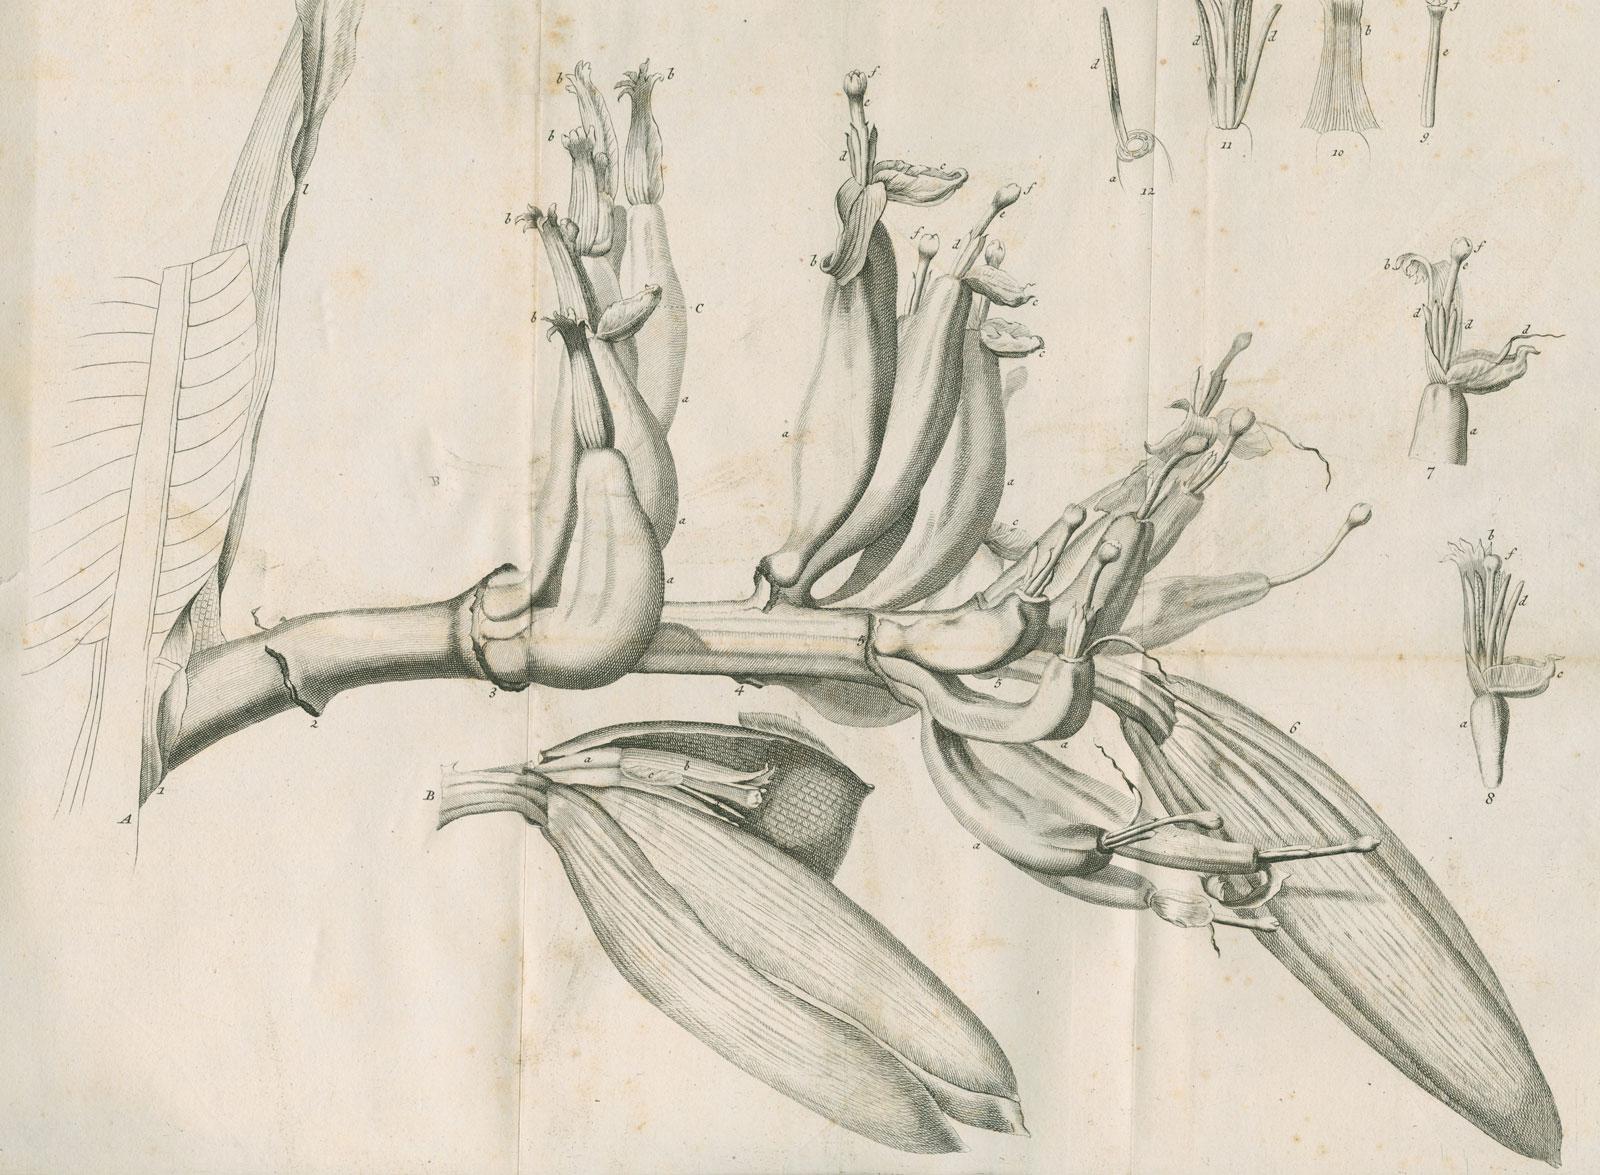 <em>Musa Cliffortiana</em> (Clifford's banana plant), engraving by Martin Hoffman, 1736